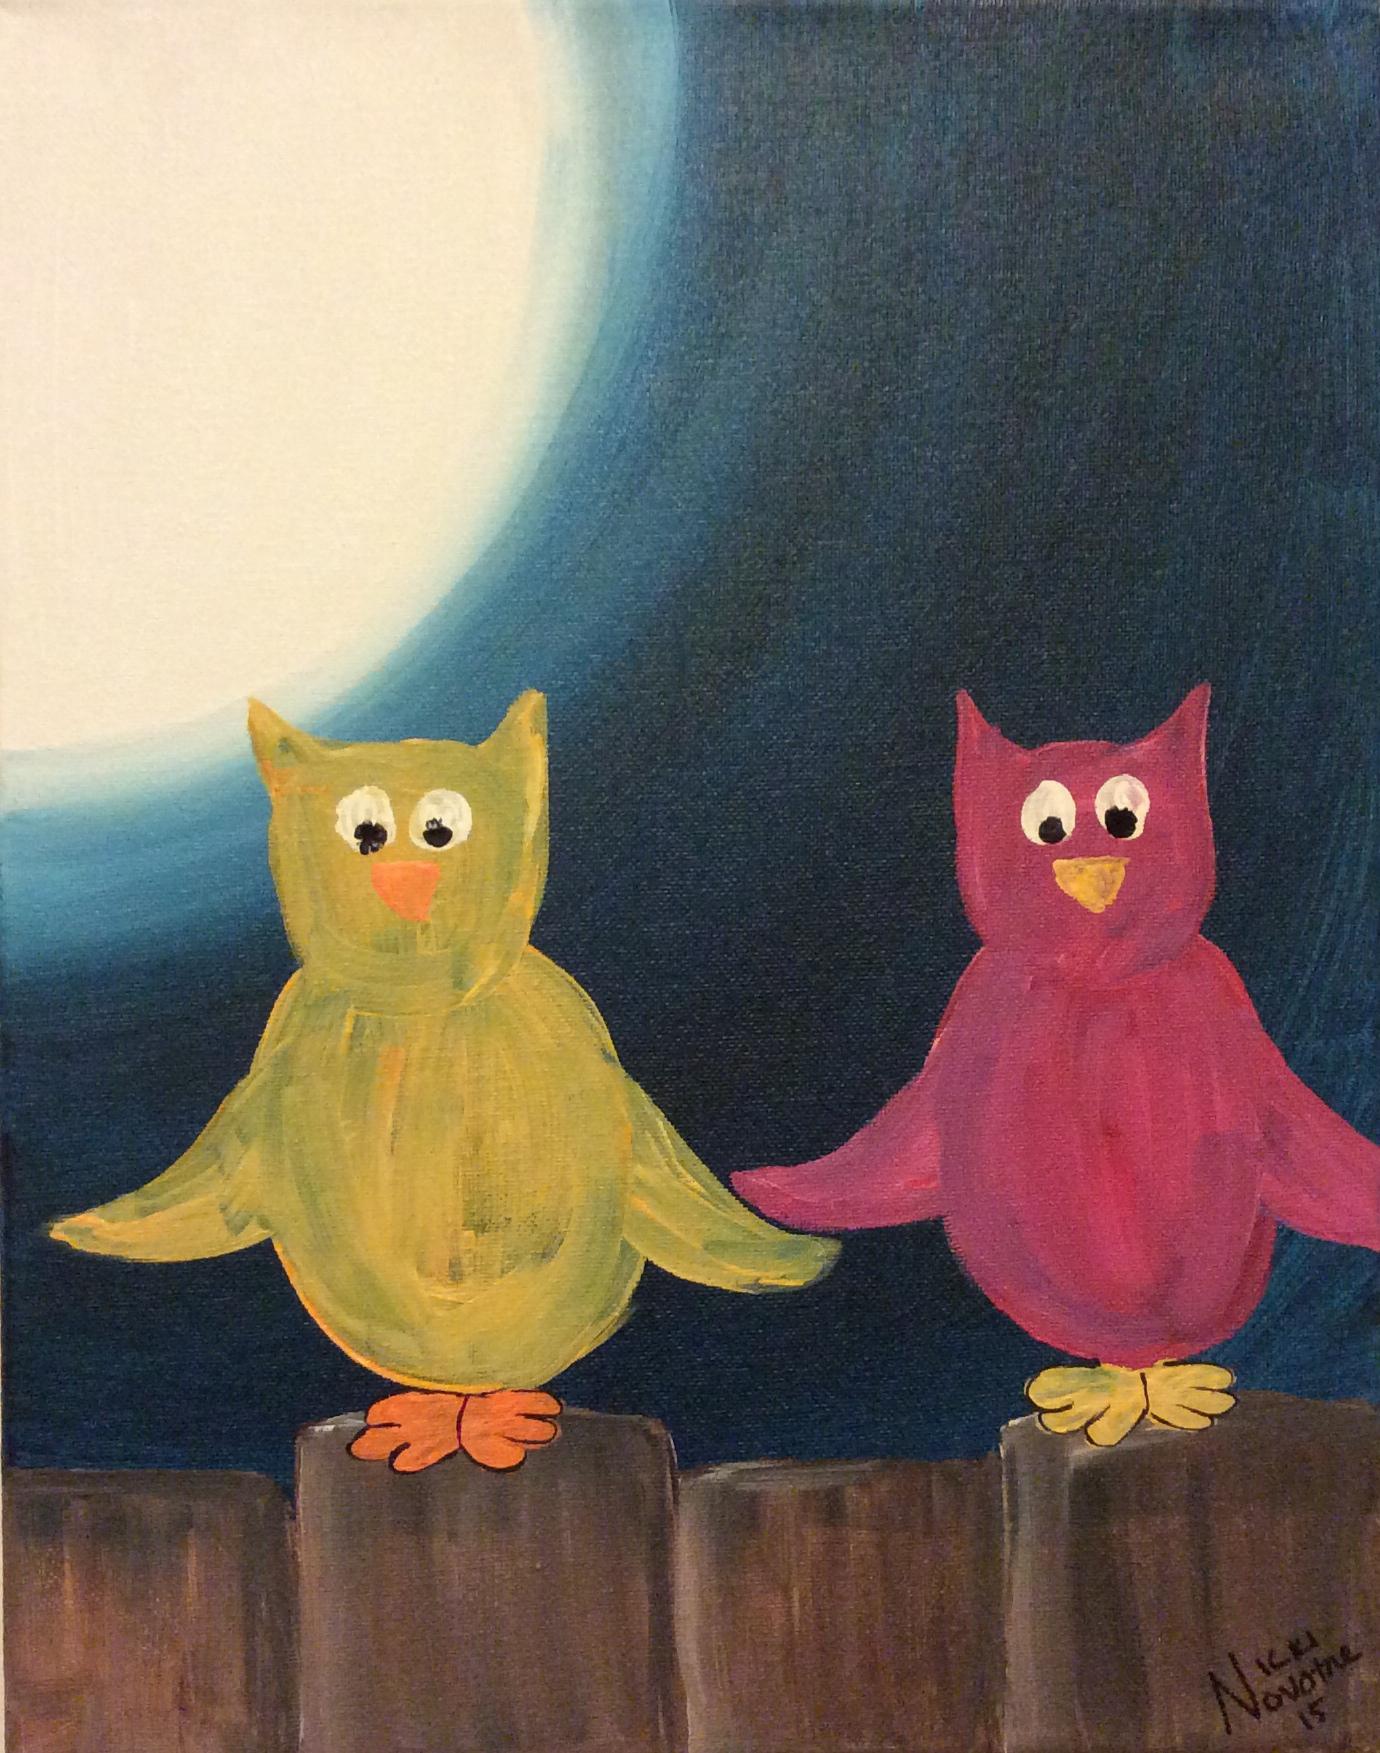 Lil owls